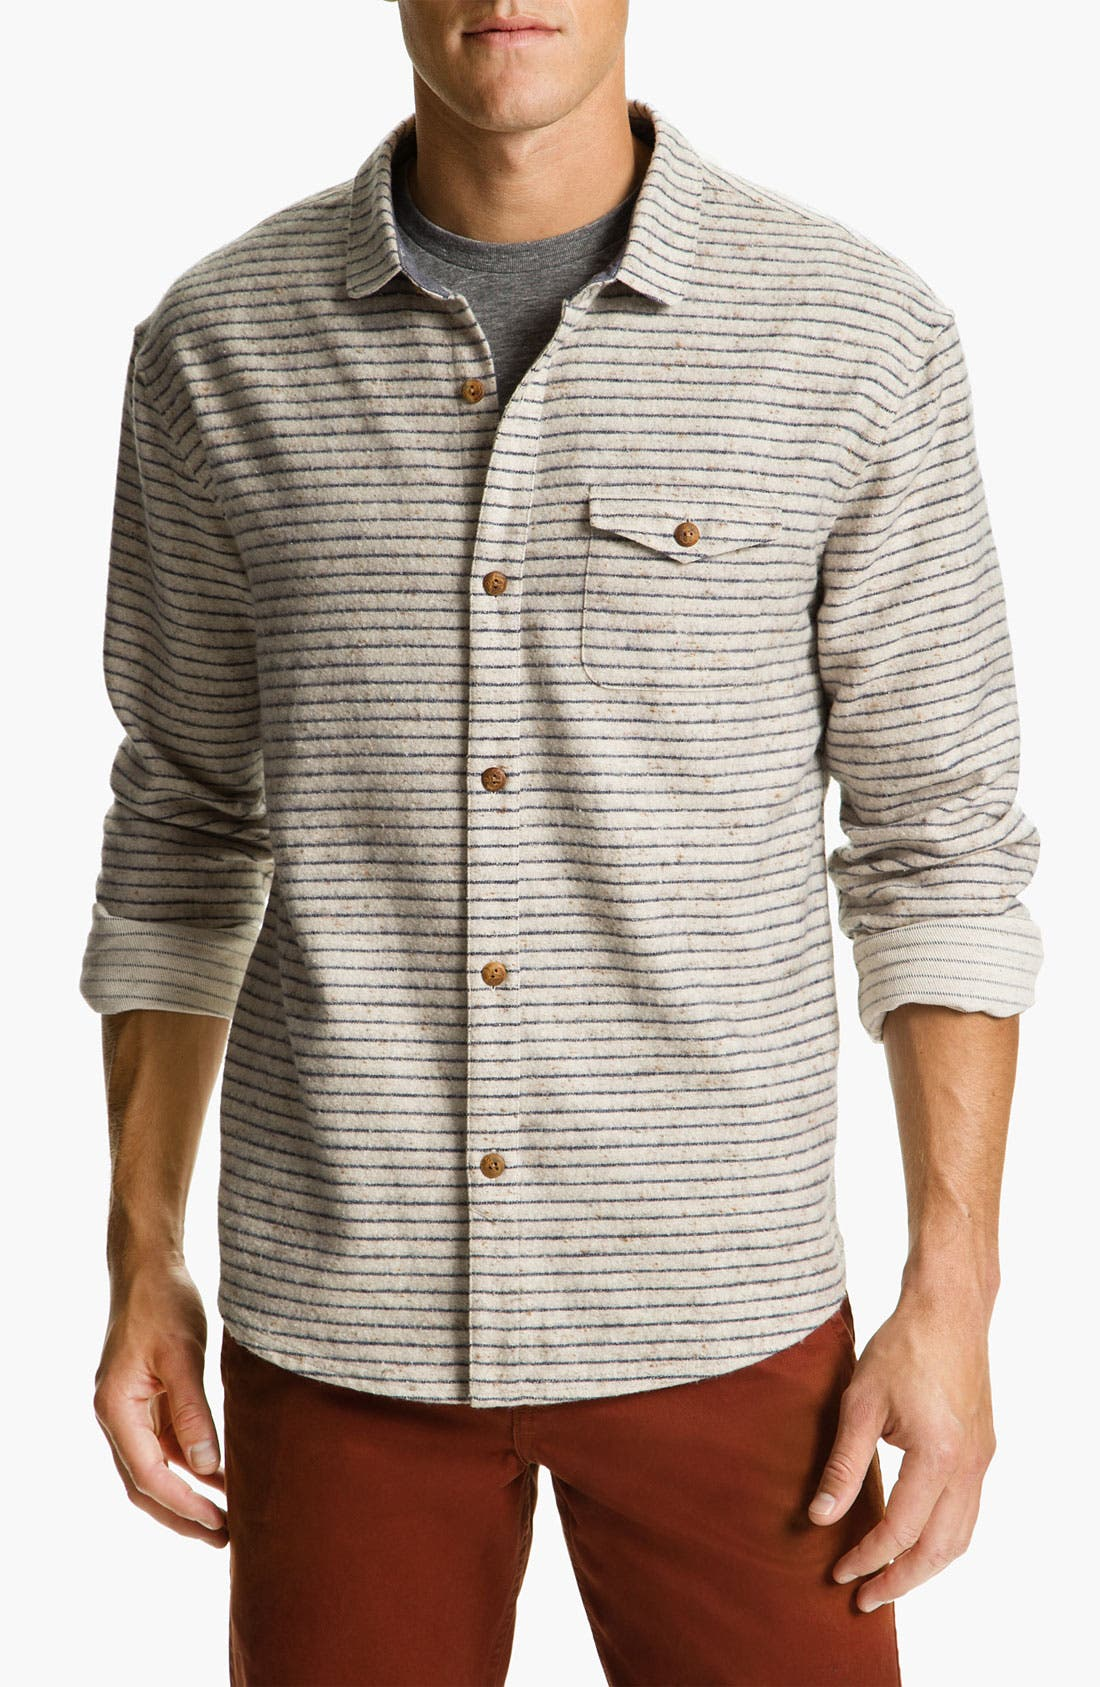 Main Image - Riviera Club 'Tonic' Stripe Woven Shirt